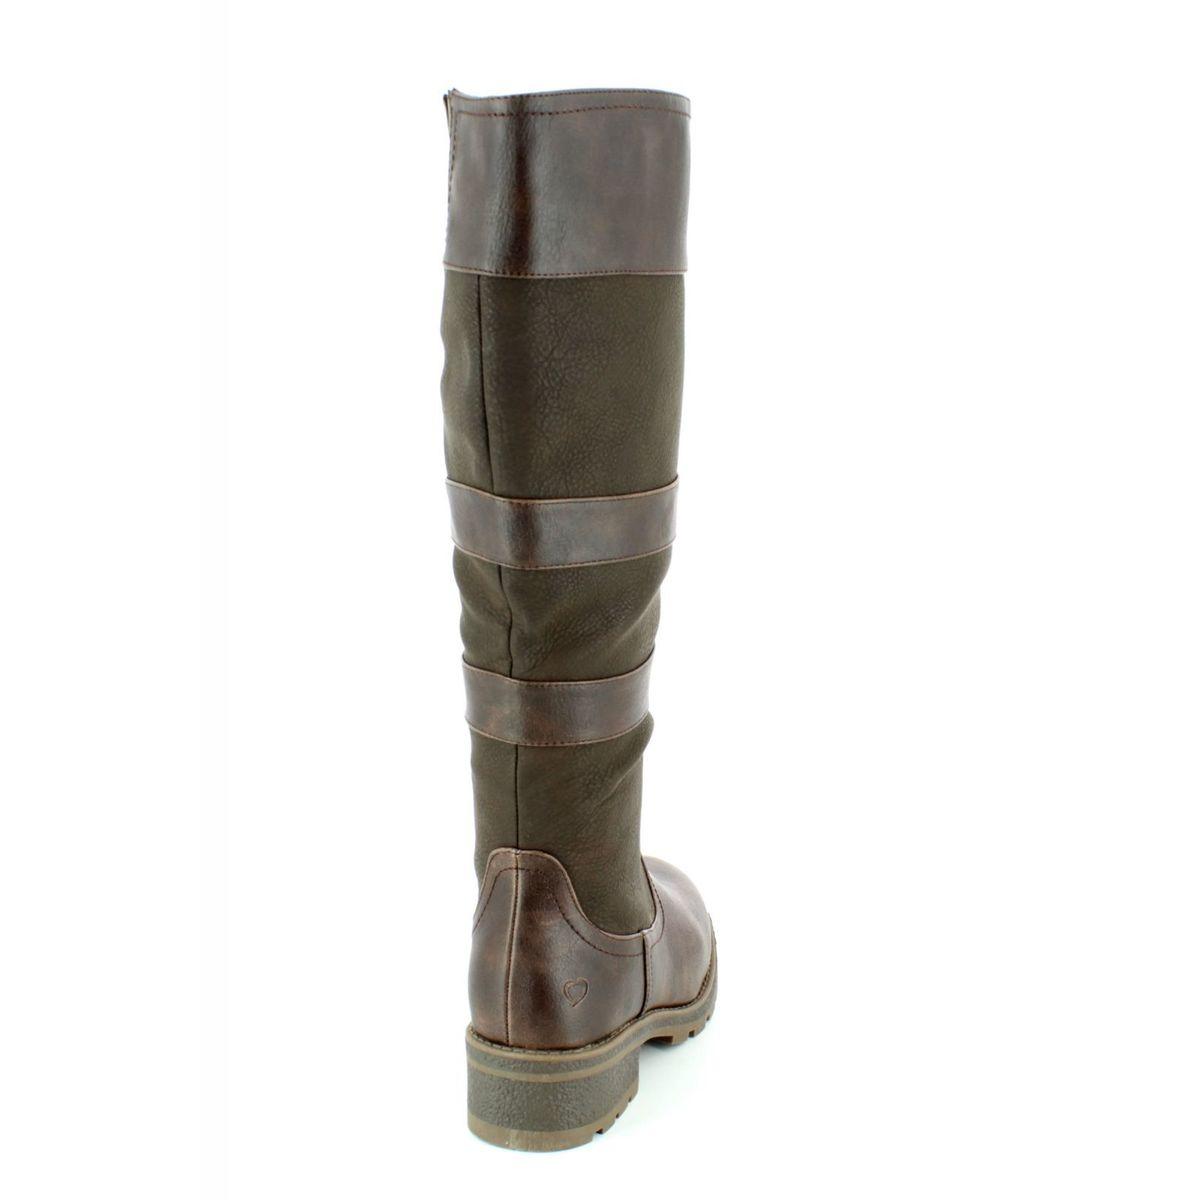 2cdea73d Heavenly Feet Knee-high Boots - Chocolate brown - 7222/22 BURLEY 4